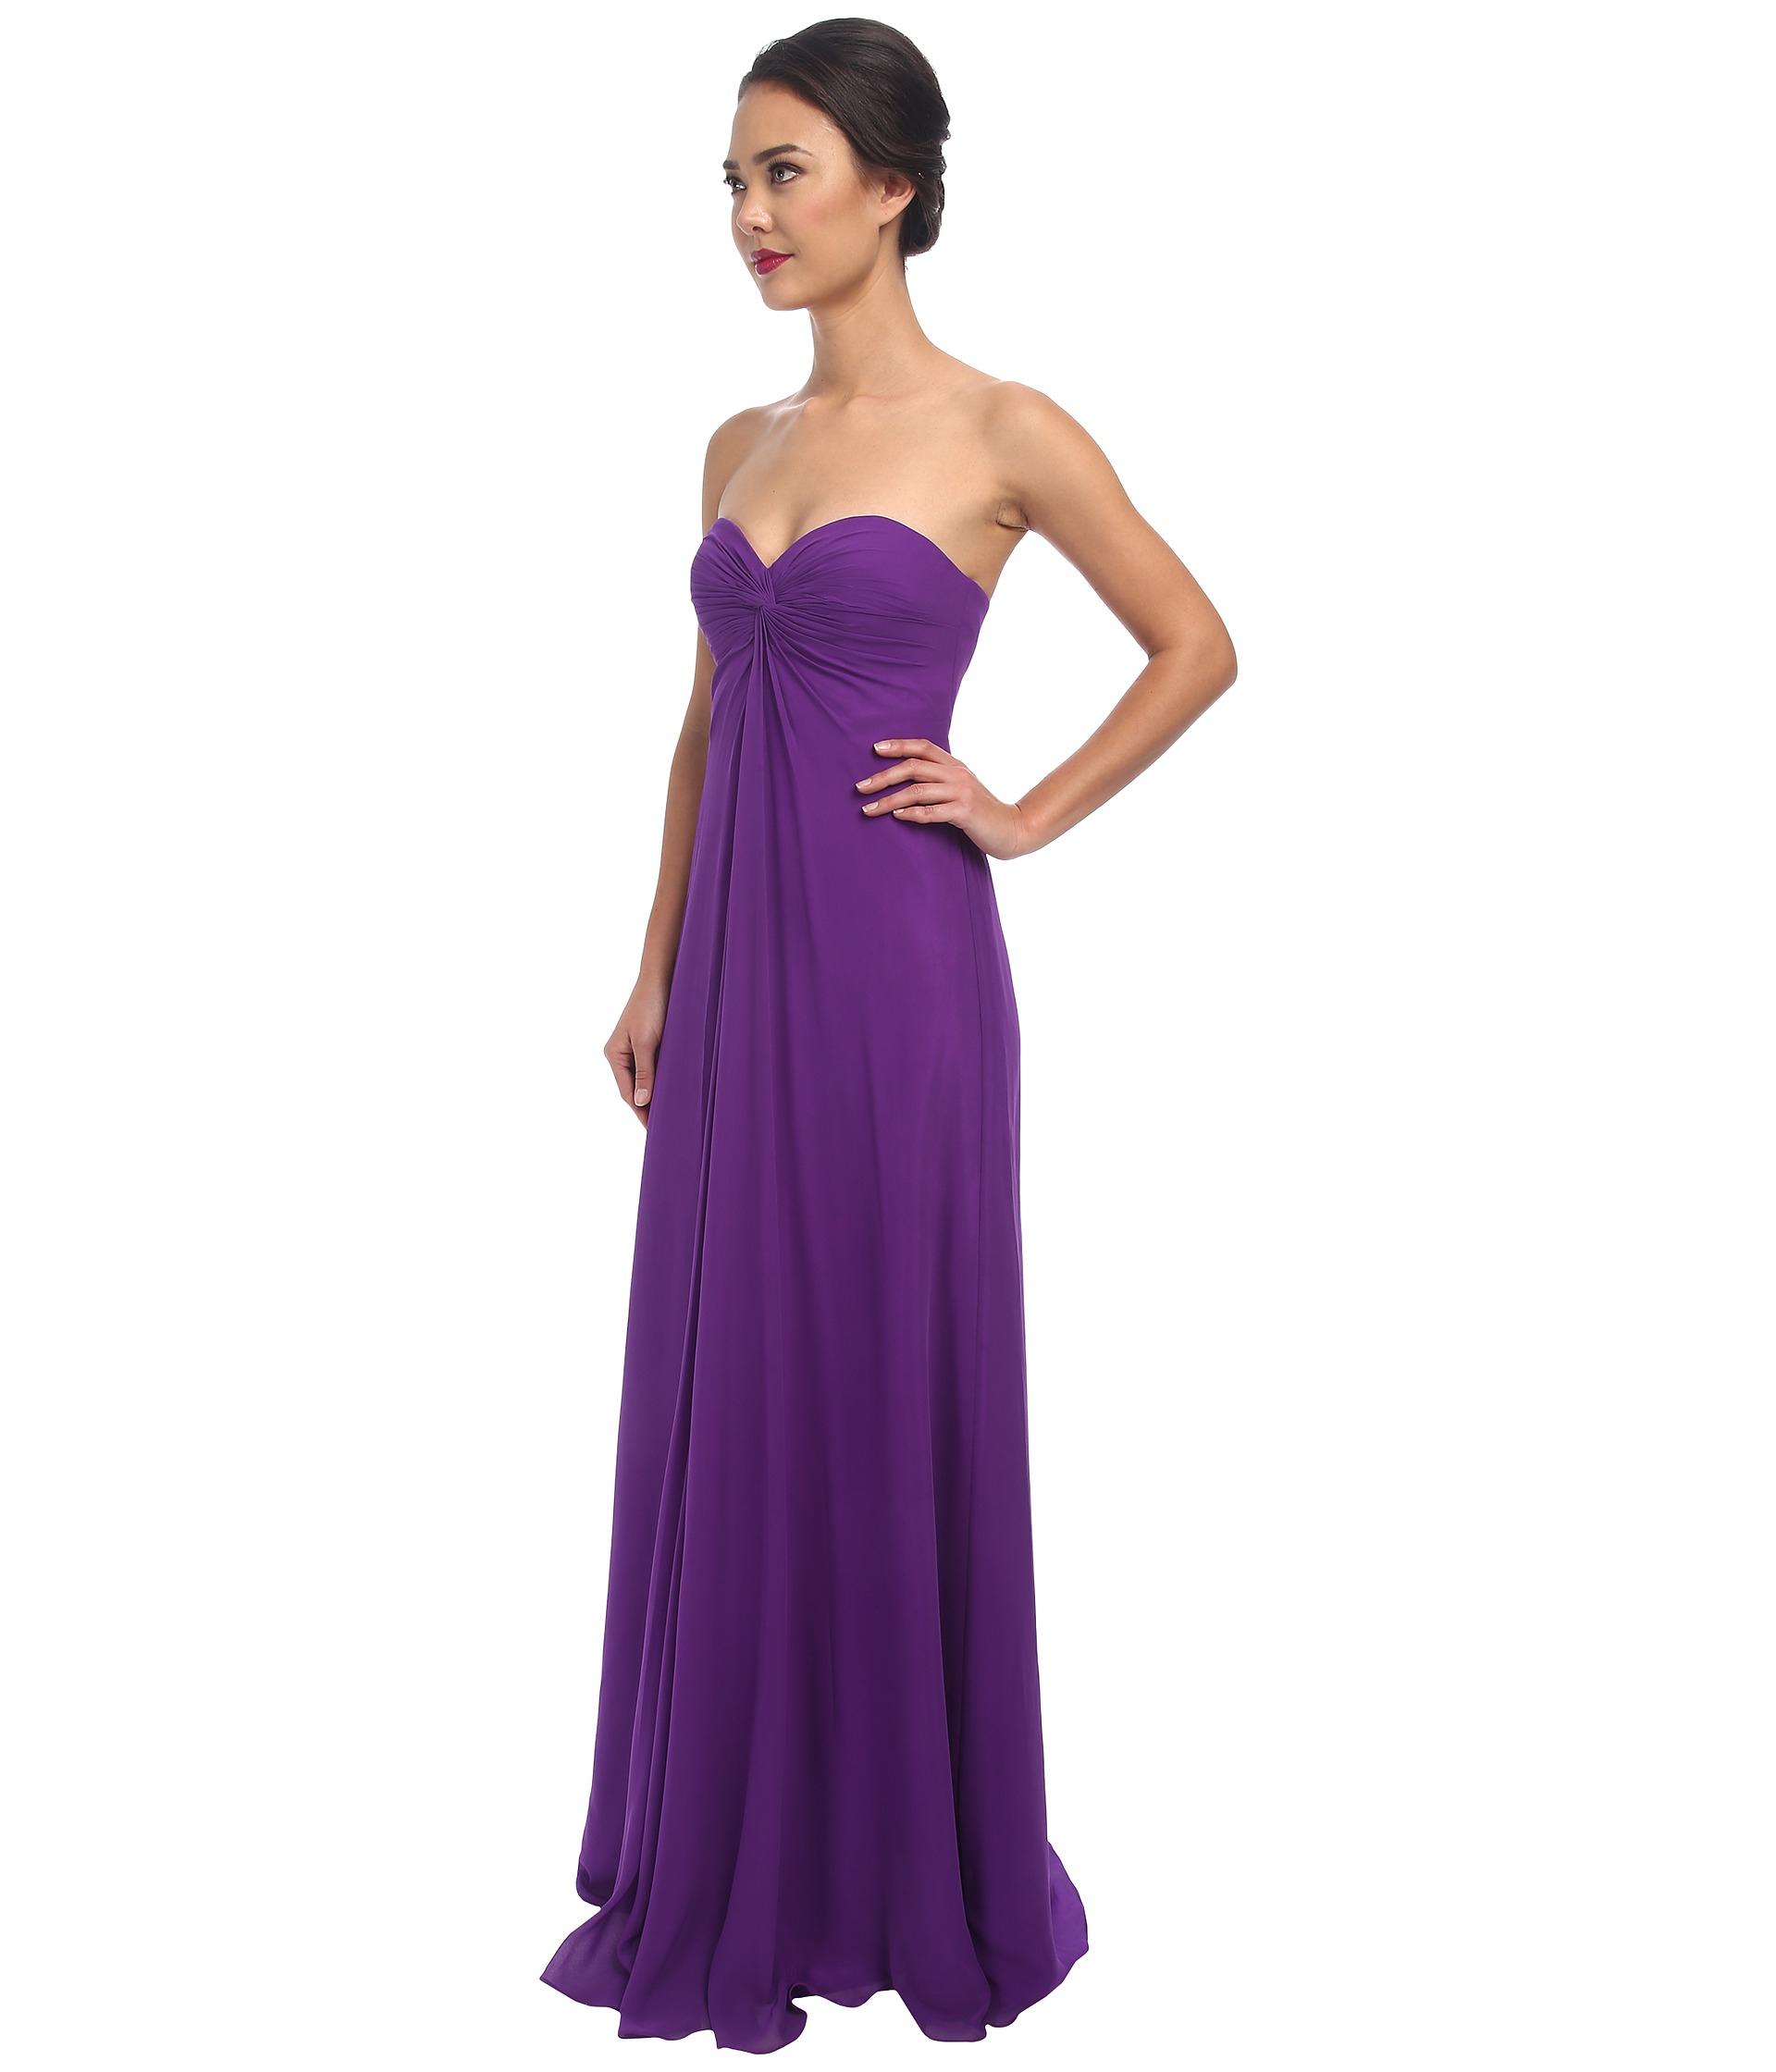 Purple Bridesmaid Dresses Under 50 Dollars – Fashion dresses